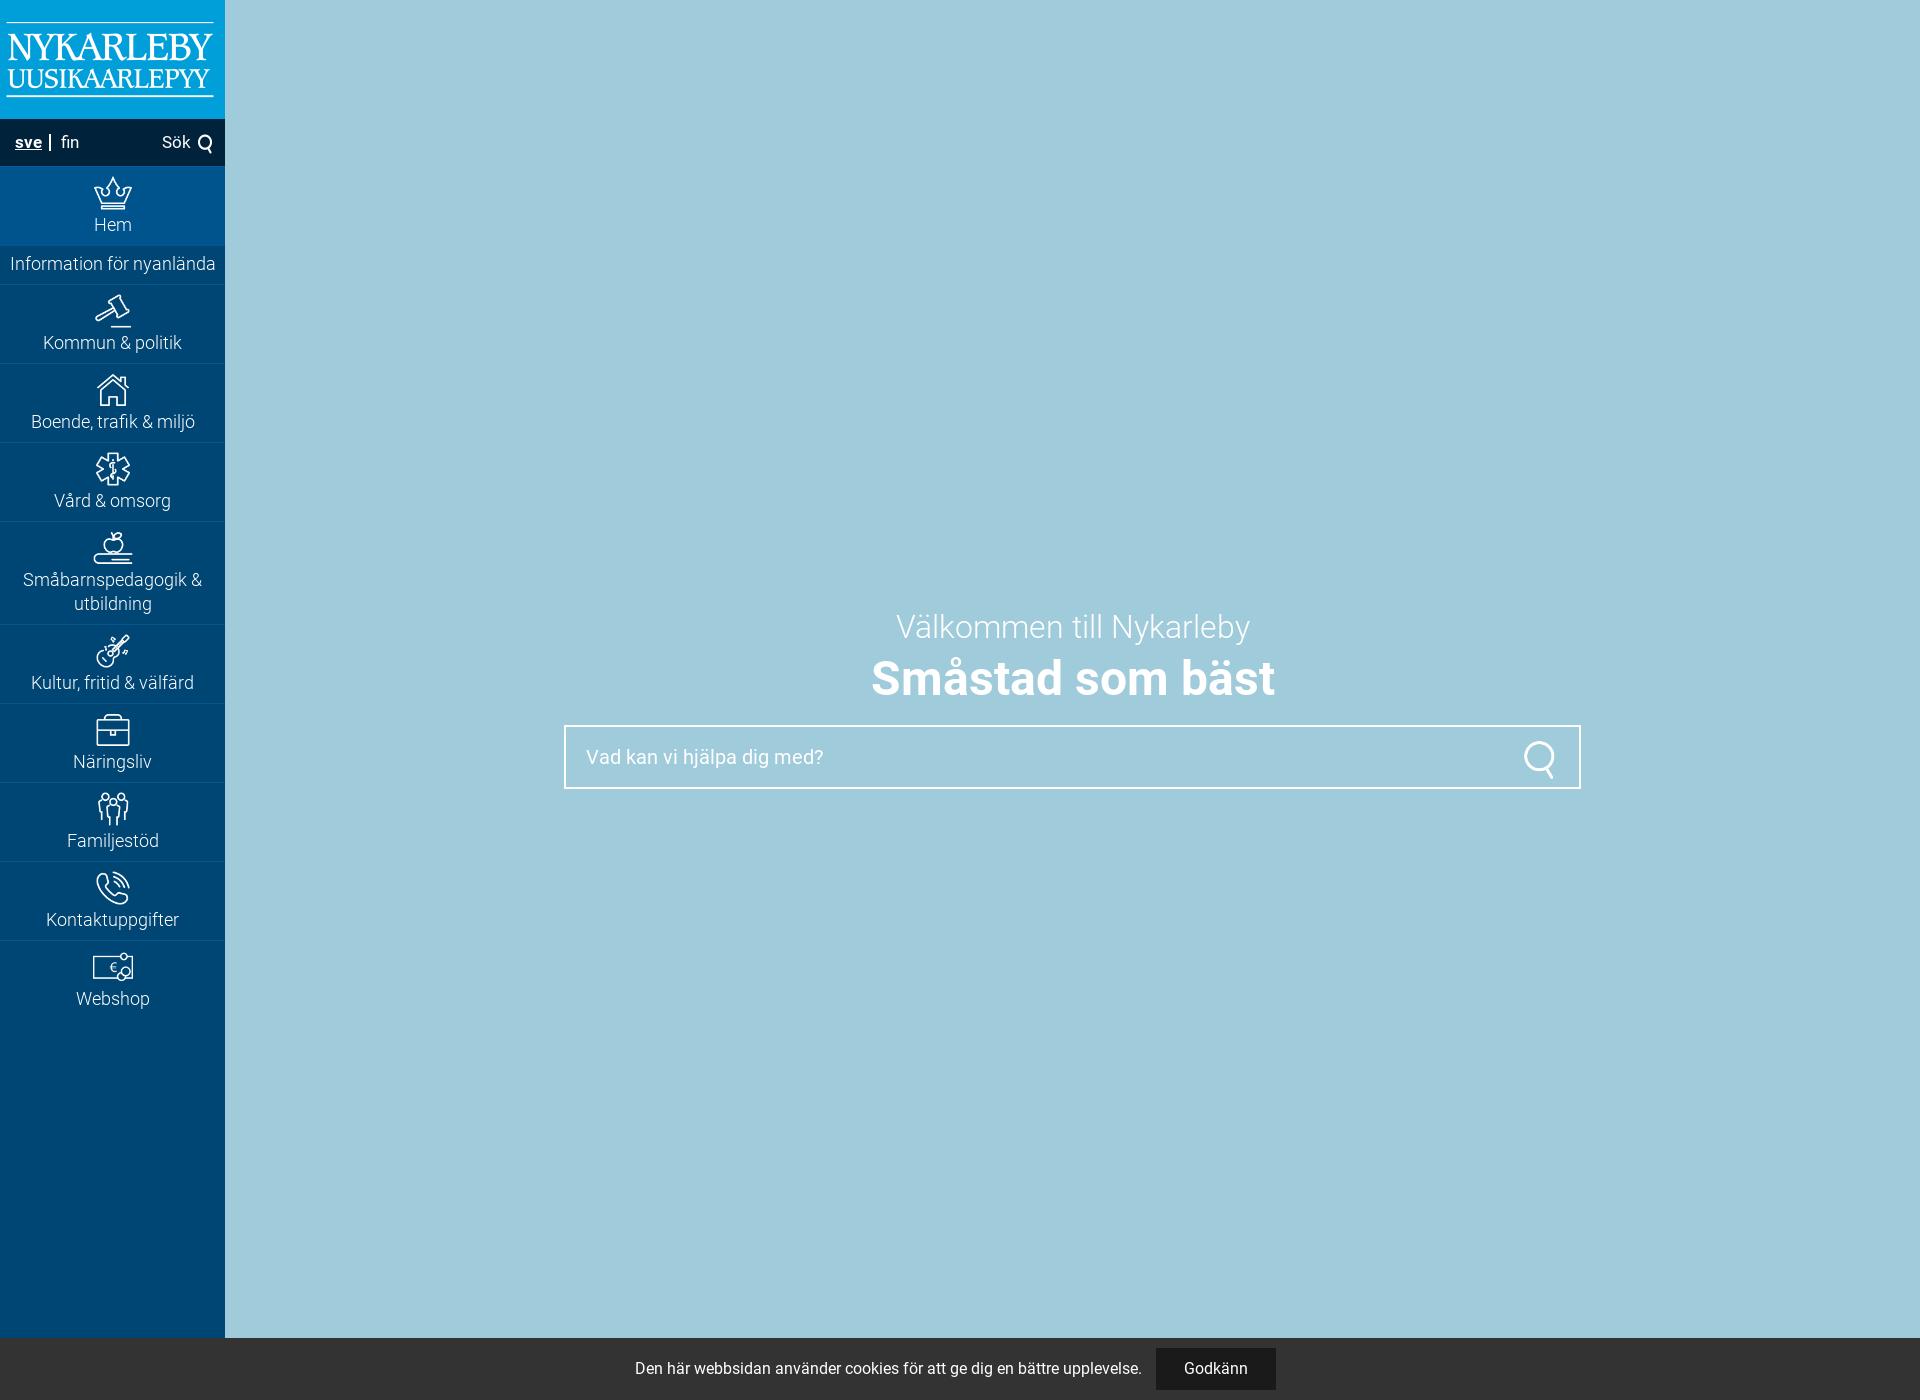 Screenshot for nykarleby.fi